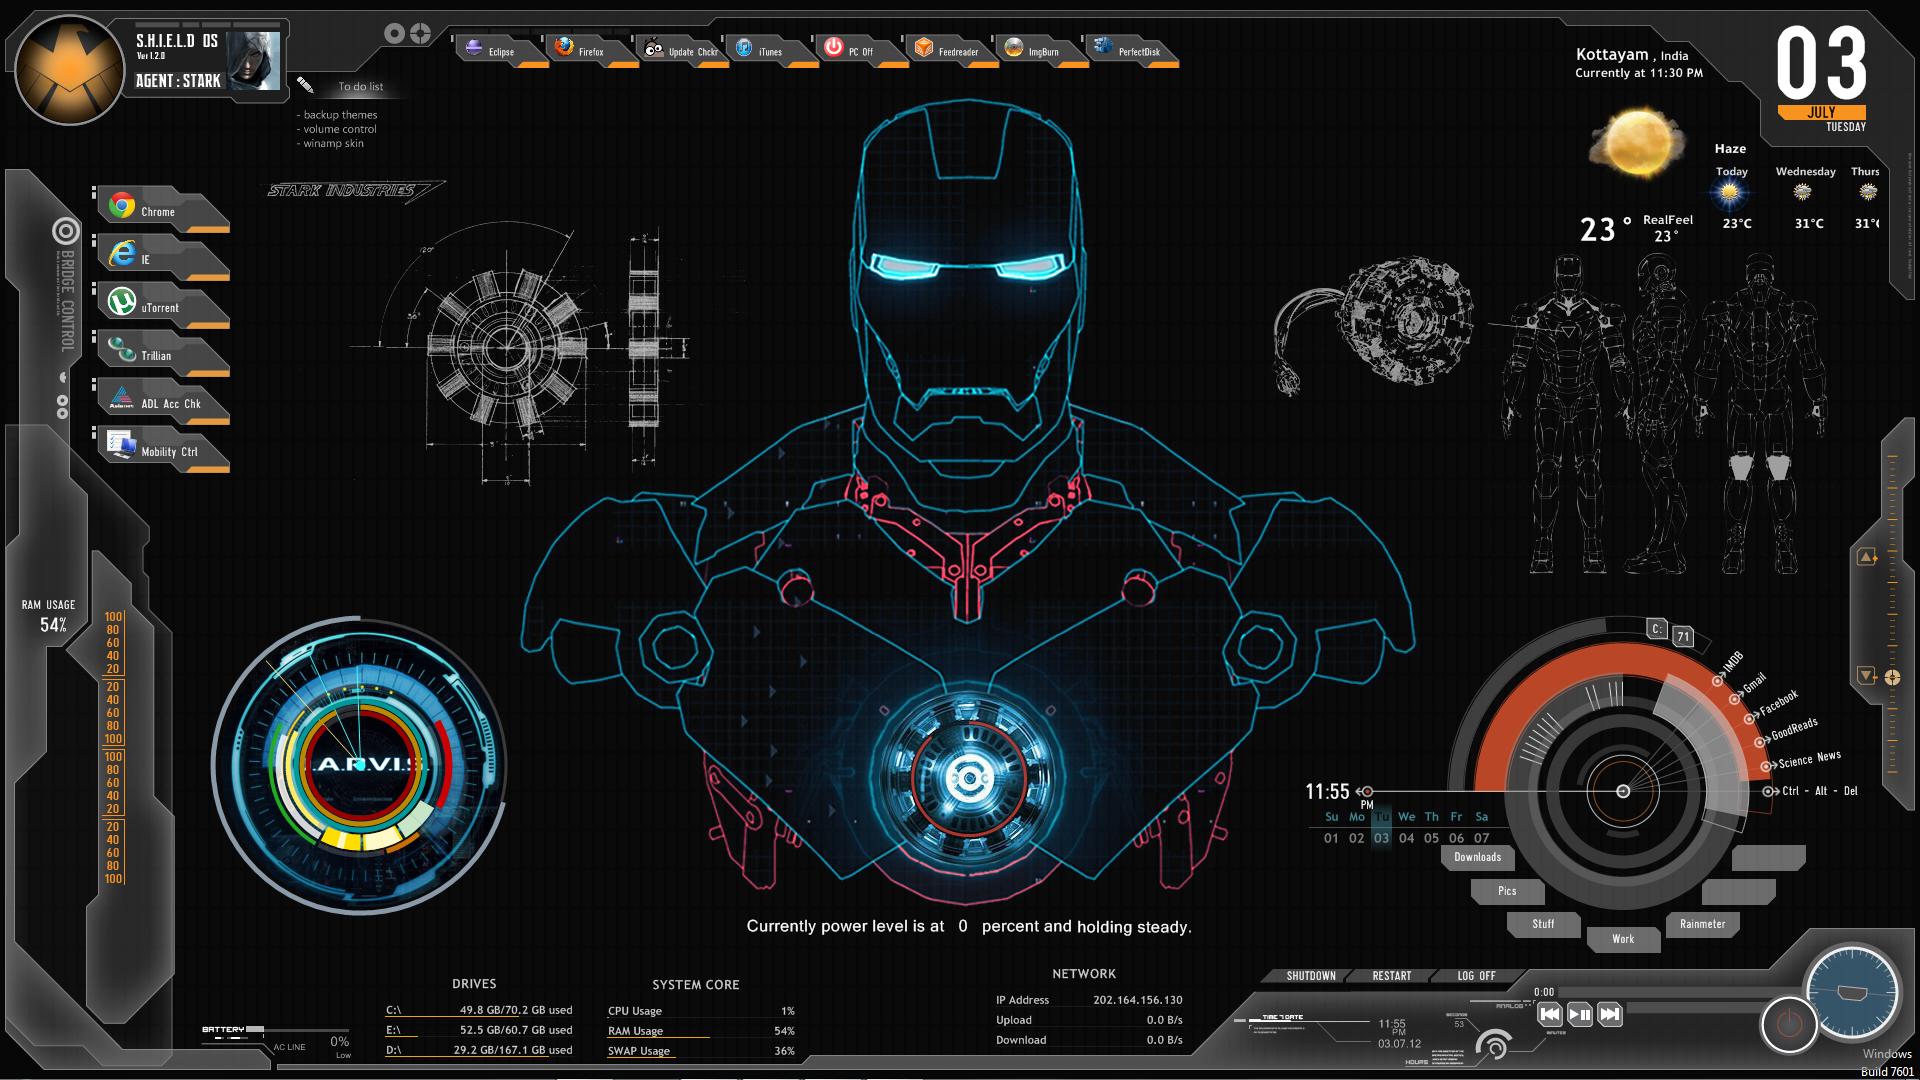 shield ironman jarvis rainmeter theme screenshot by ferozkhanhamid